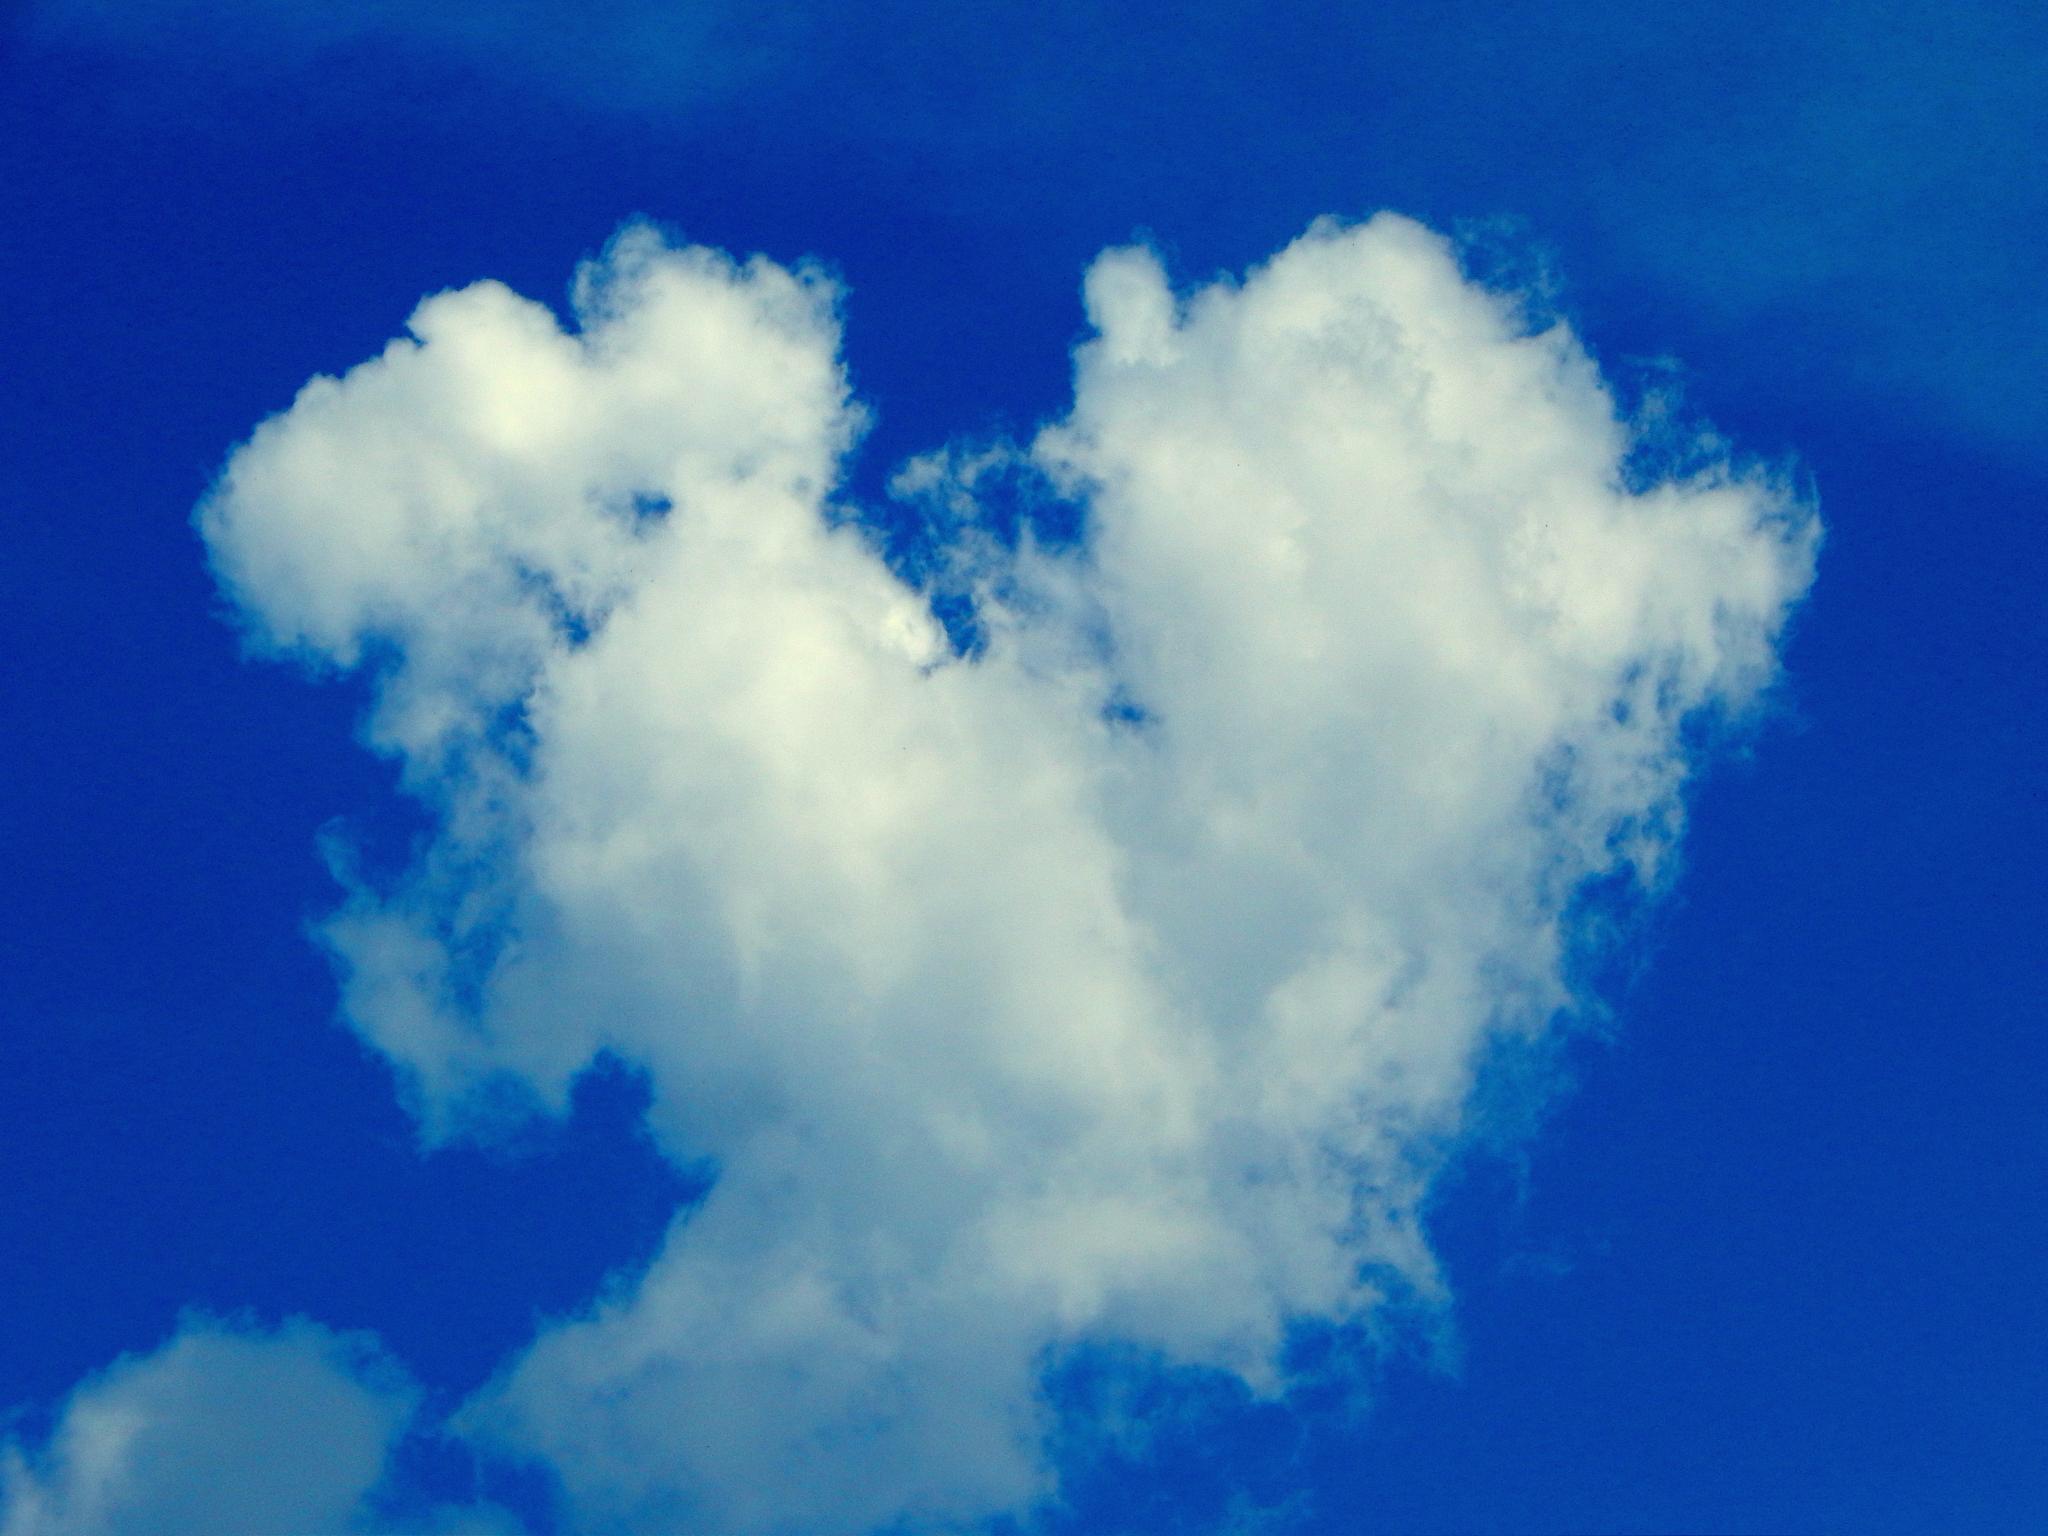 Clouds Heart by Utkarsh Shenvi